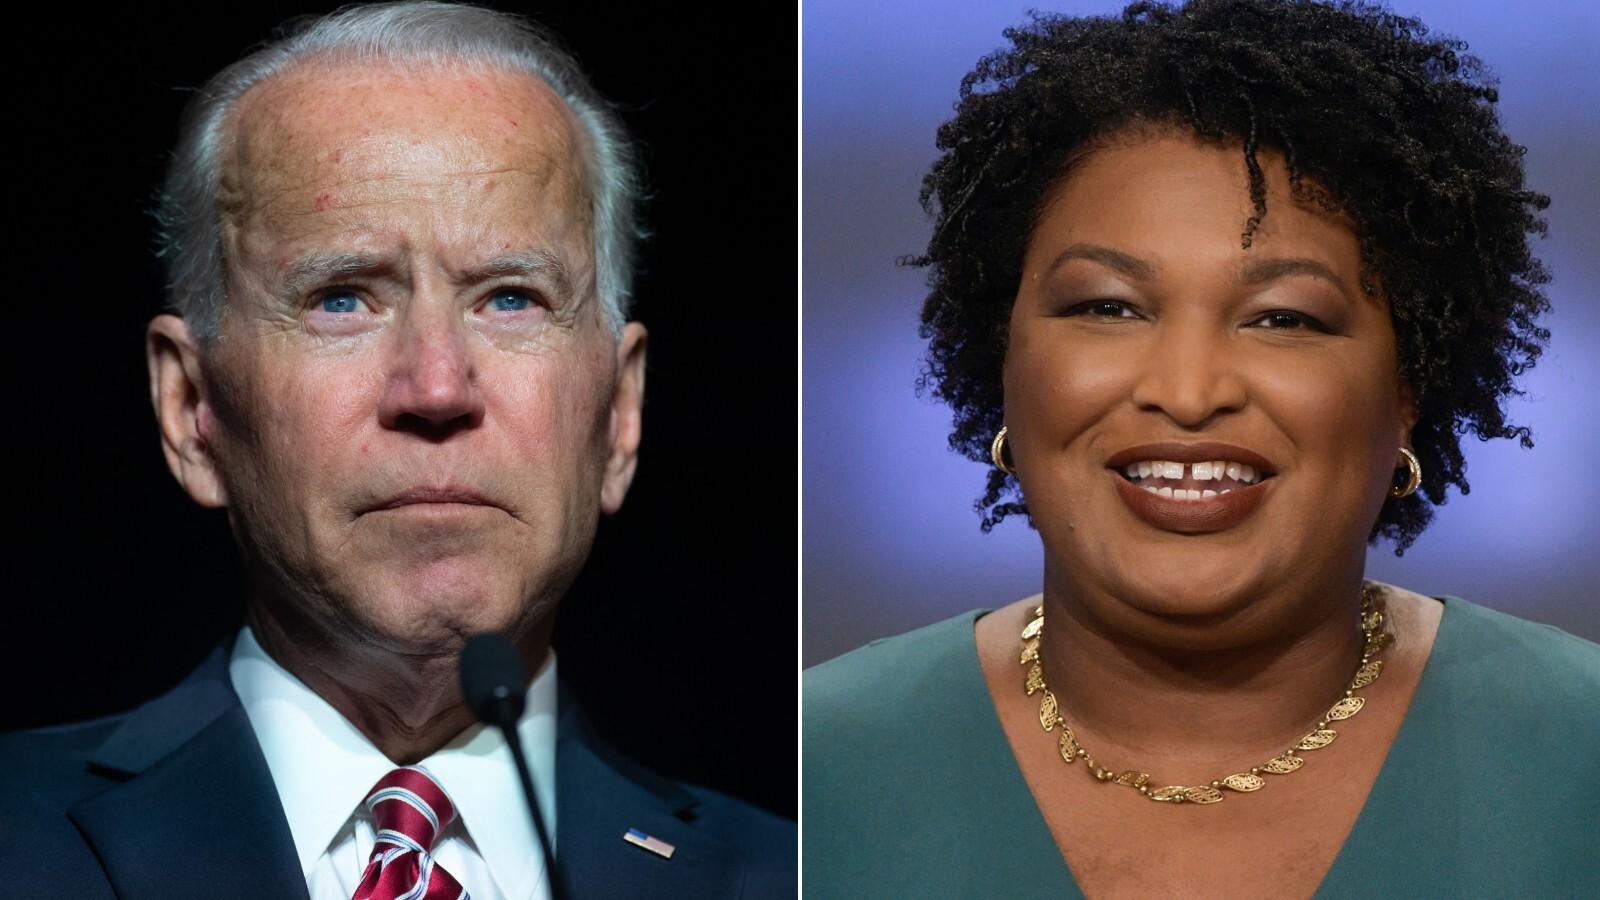 www.cbs58.com: Biden will meet with Stacey Abrams in Atlanta